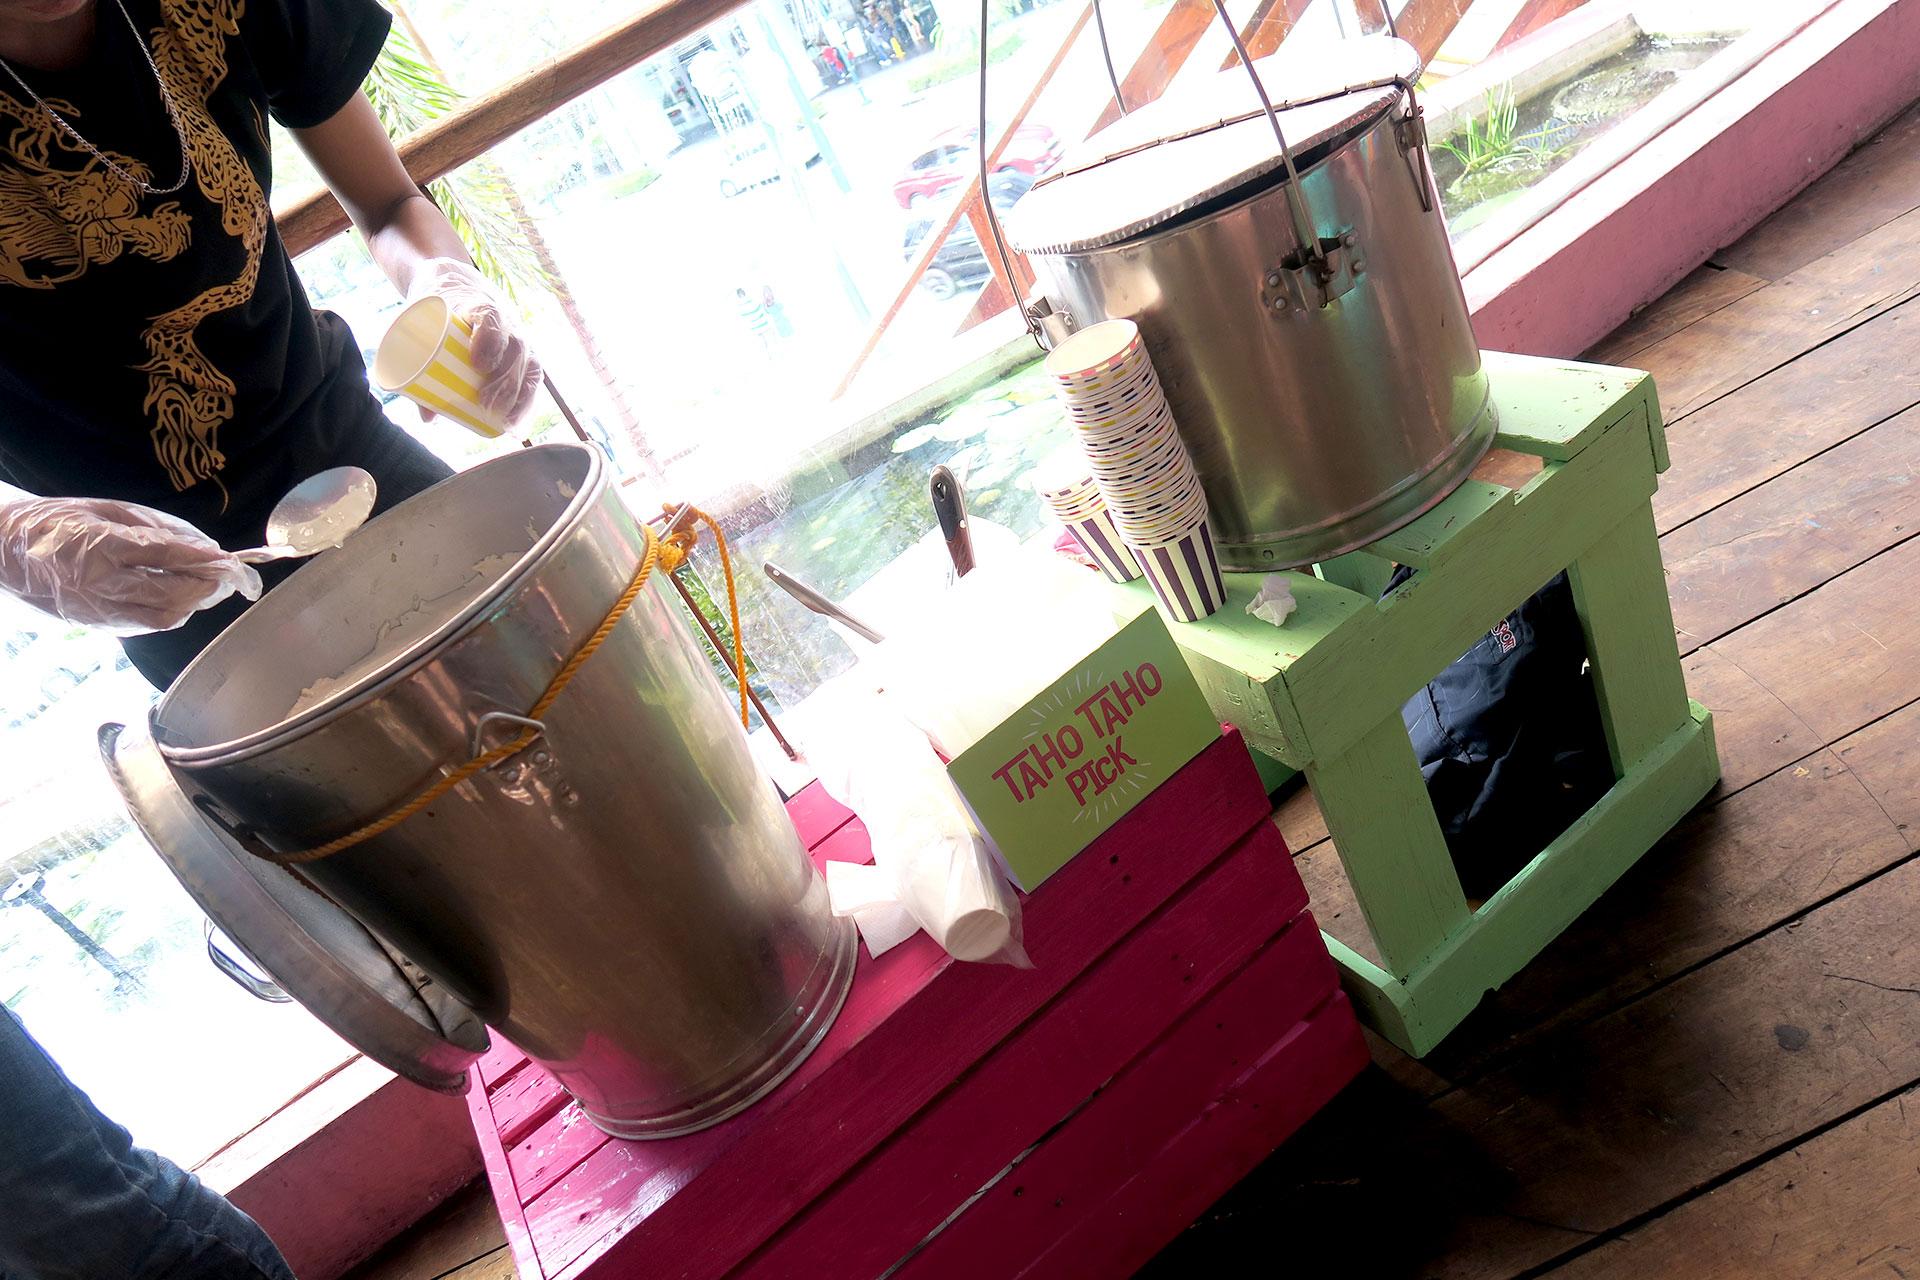 14 Locally Blended Juice Drink Review Photos - Gen-zel She Sings Beauty